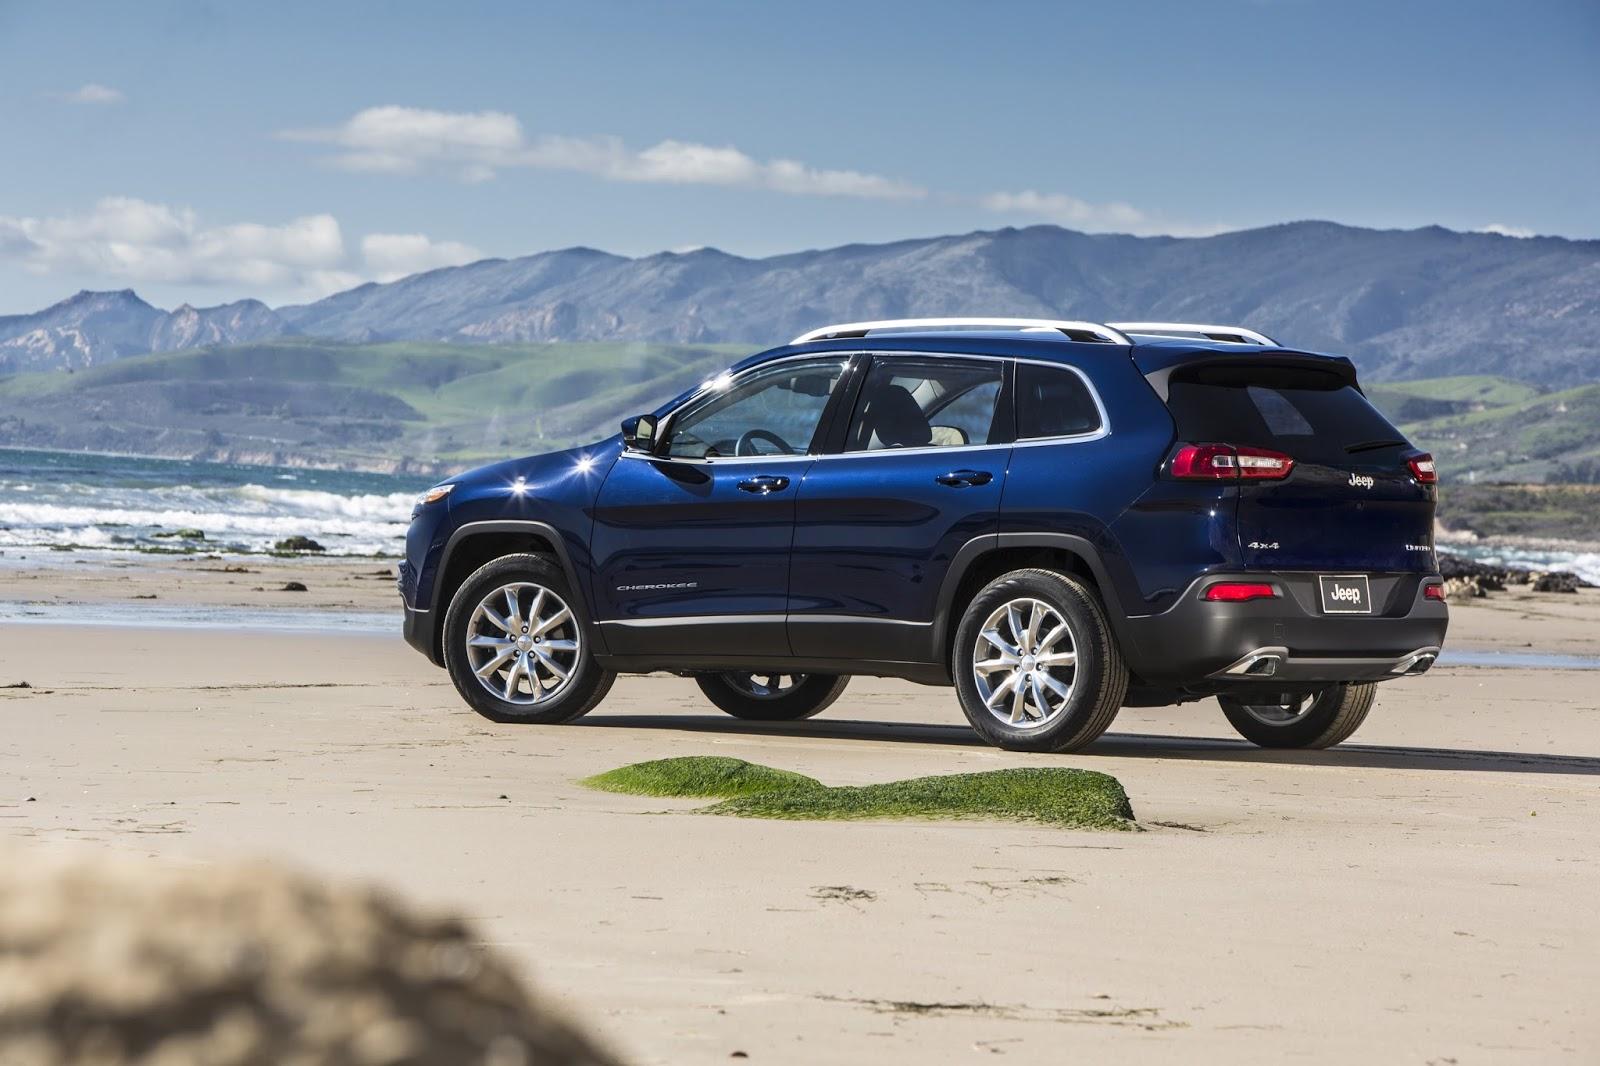 F2 Δοκιμάζουμε αν το νέο Jeep Cherokee… κολλάει πουθενά Jeep, Jeep Cherokee, TEST, zblog, ΔΟΚΙΜΕΣ